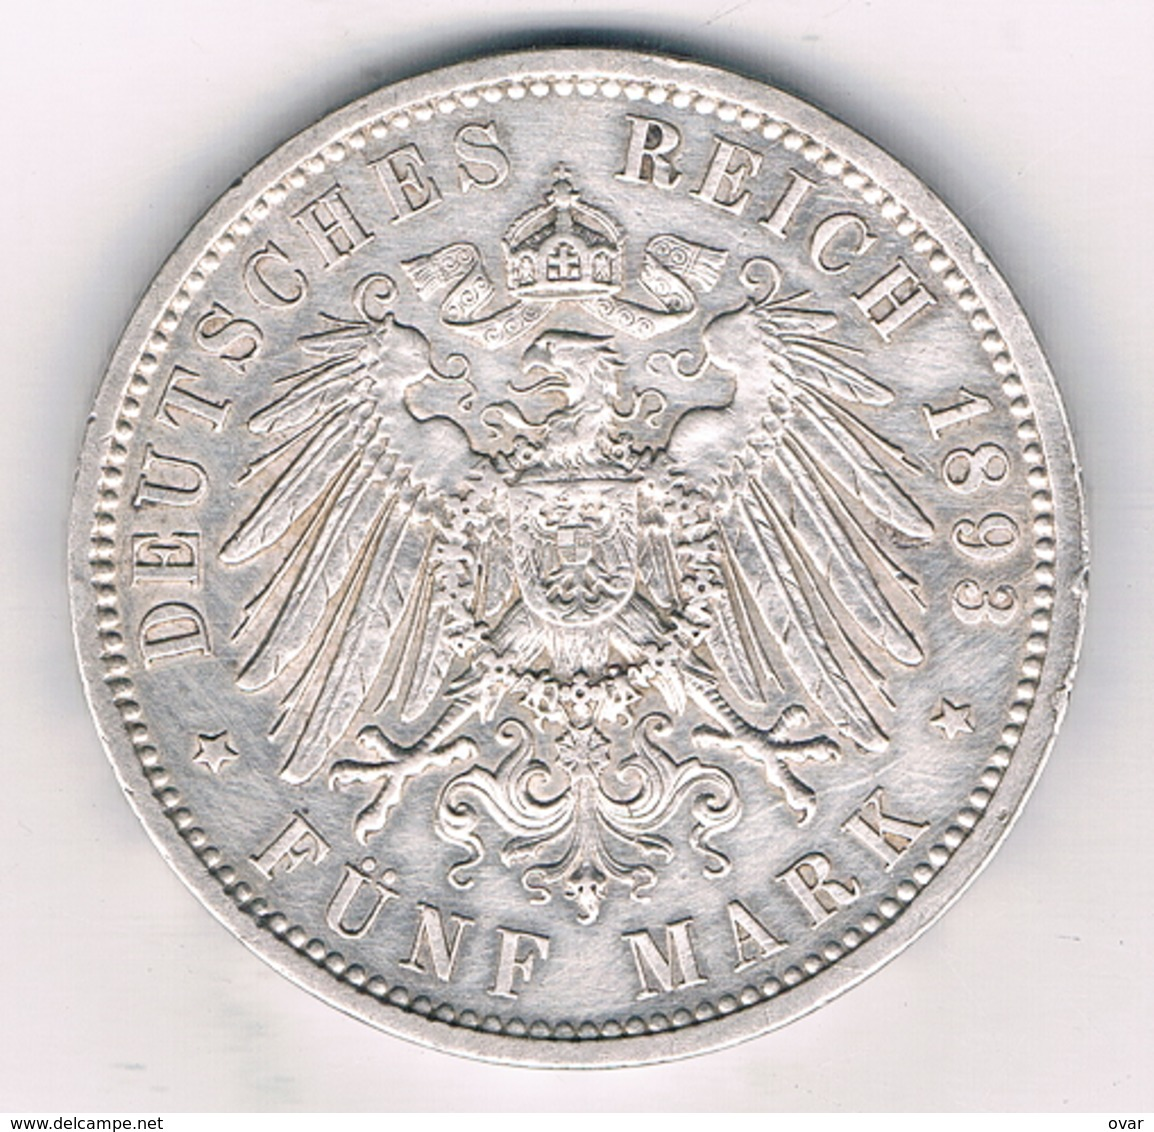 5 MARK 1893 A DUITSLAND /4443G/ - 2, 3 & 5 Mark Silver